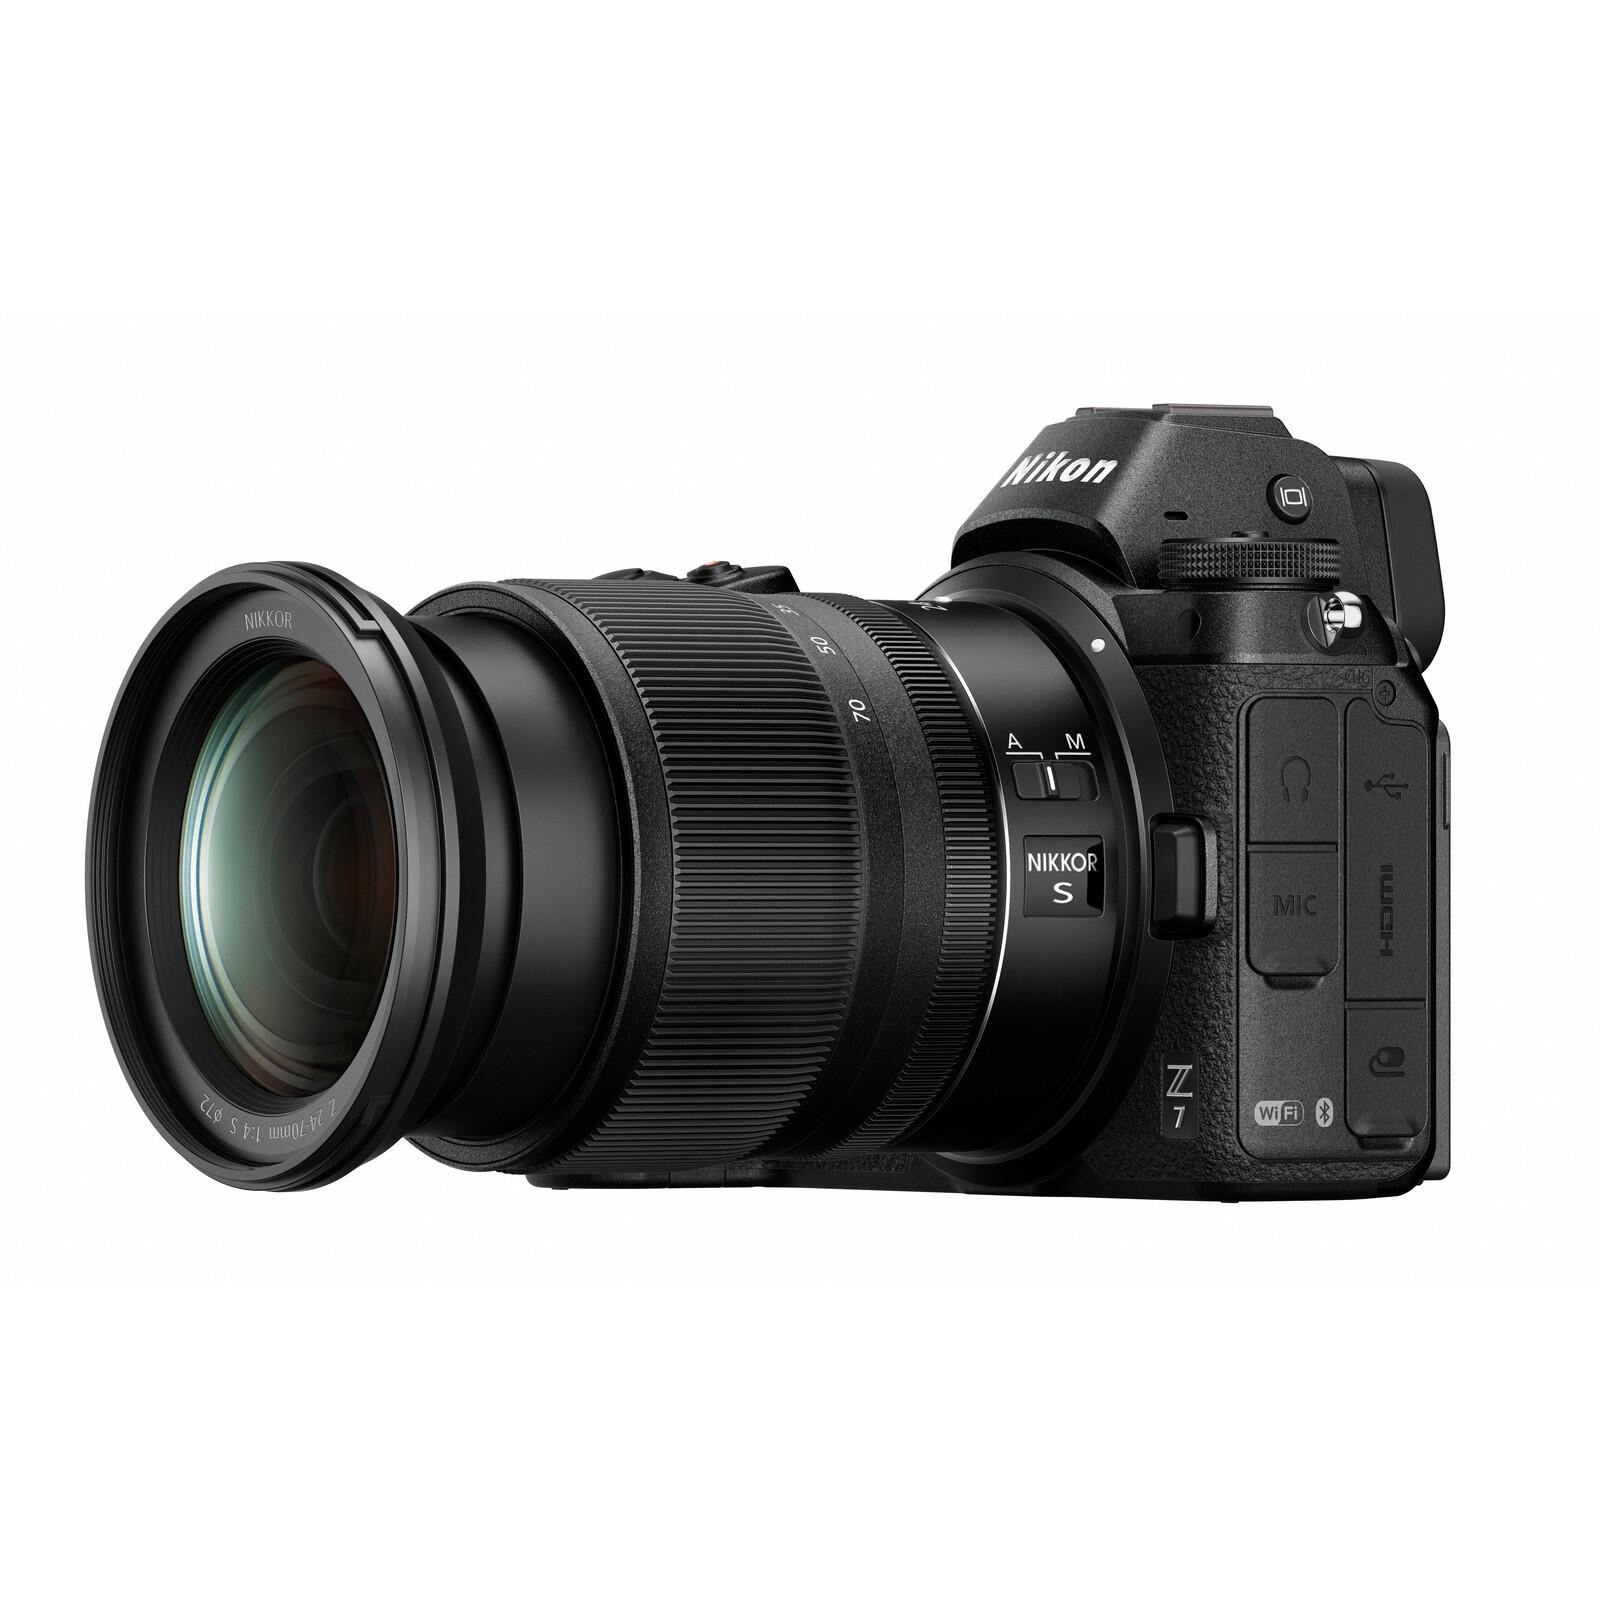 Nikon Z7 + 24-70/4,0 + 64GB XQD Speicherkarte